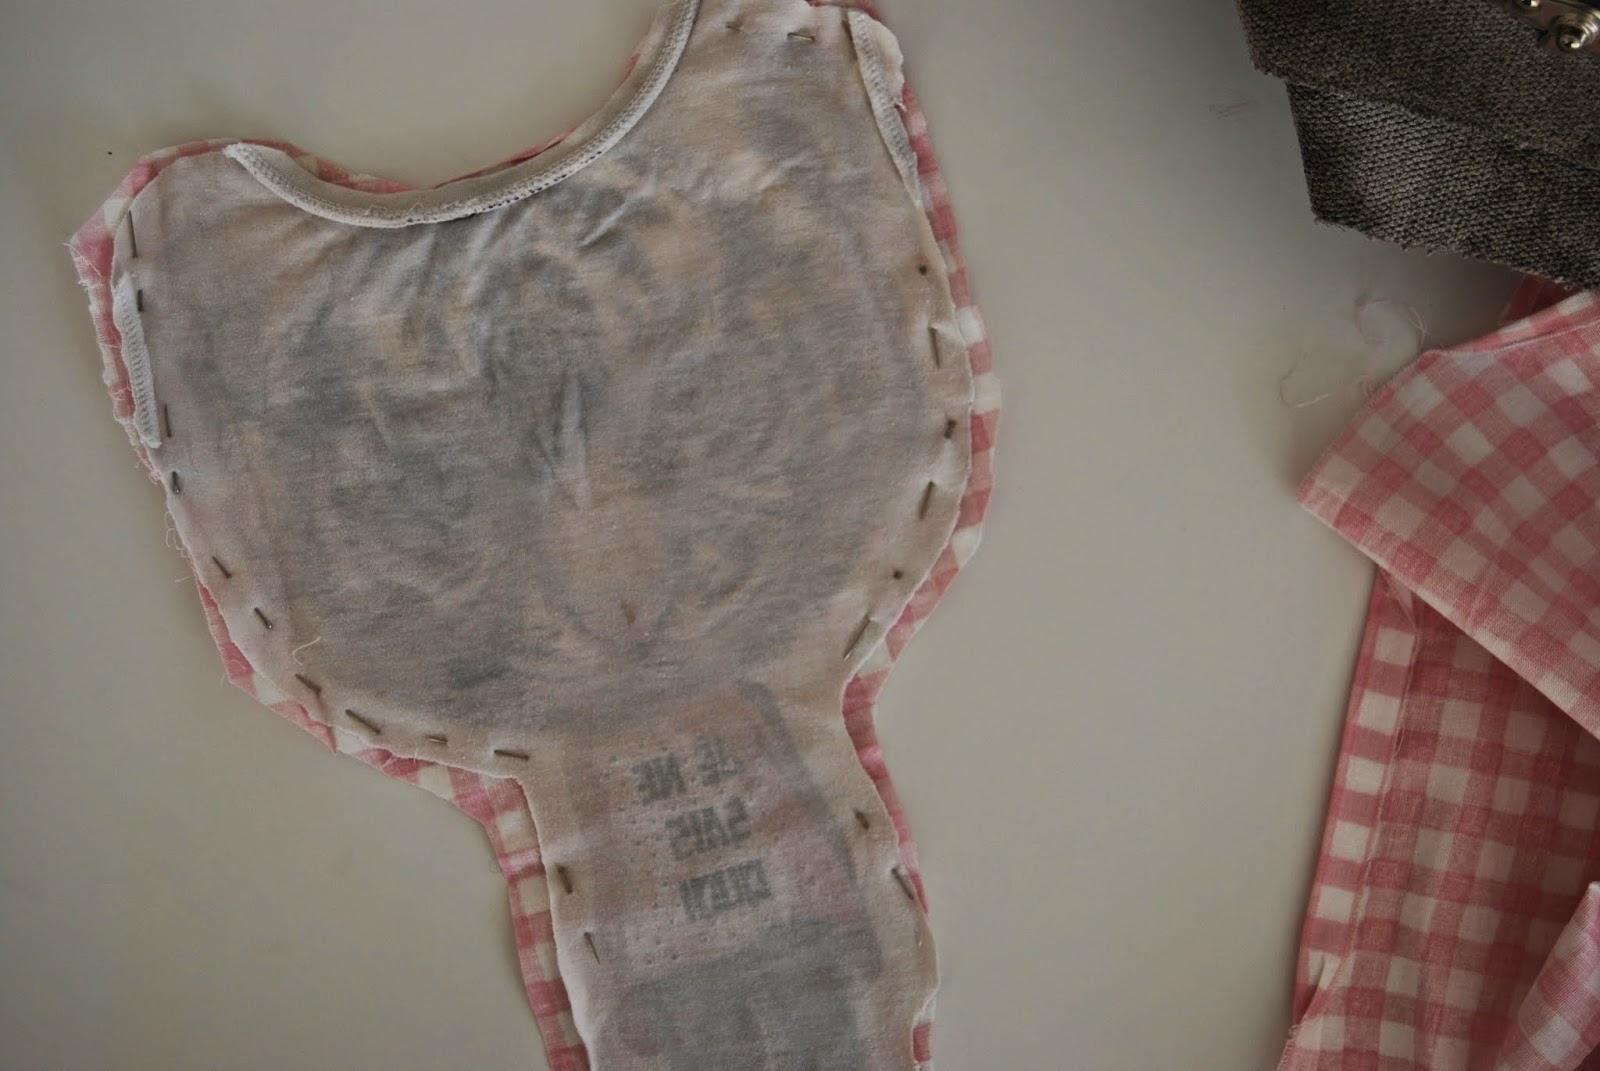 http://sosunnyblog.blogspot.com.es/2014/11/camisetas-que-se-convierten-en-cojines.html